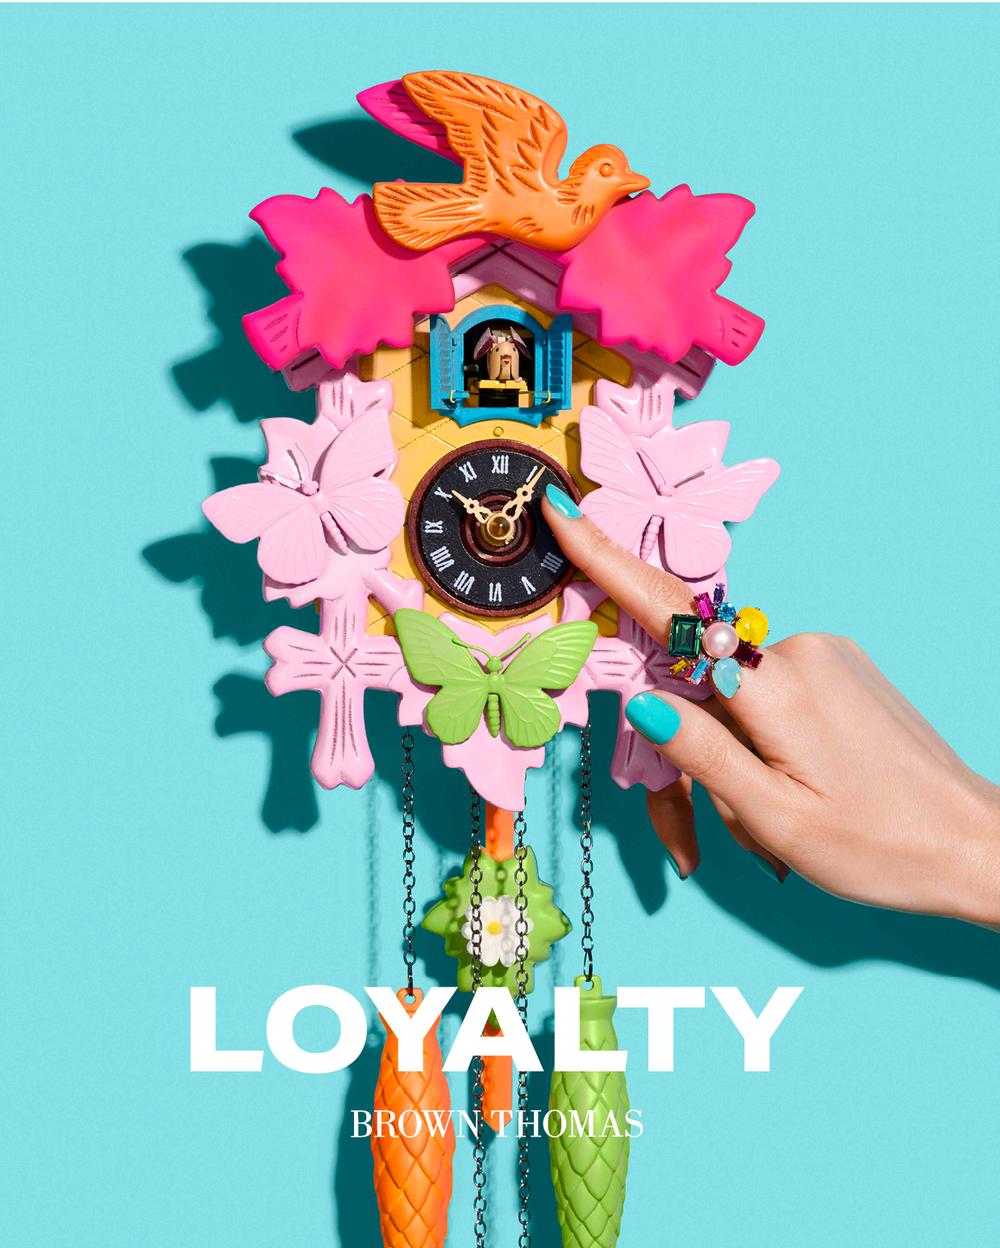 Together We Create_Brown Thomas_Loyalty_Cuckoo.png